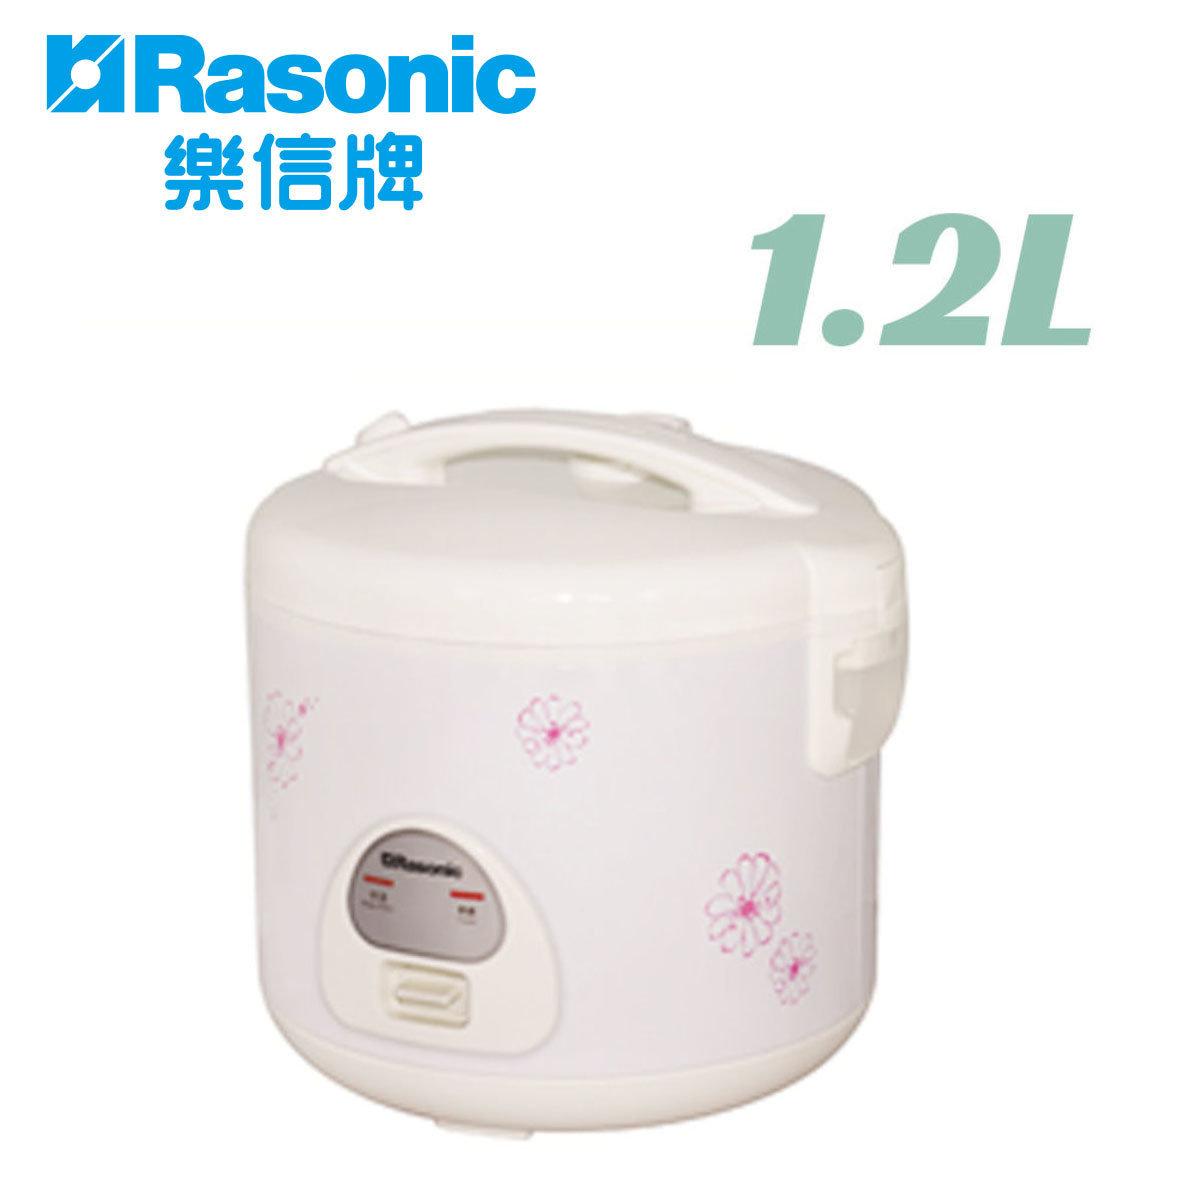 1.2L 電飯煲 - RRC-HM12